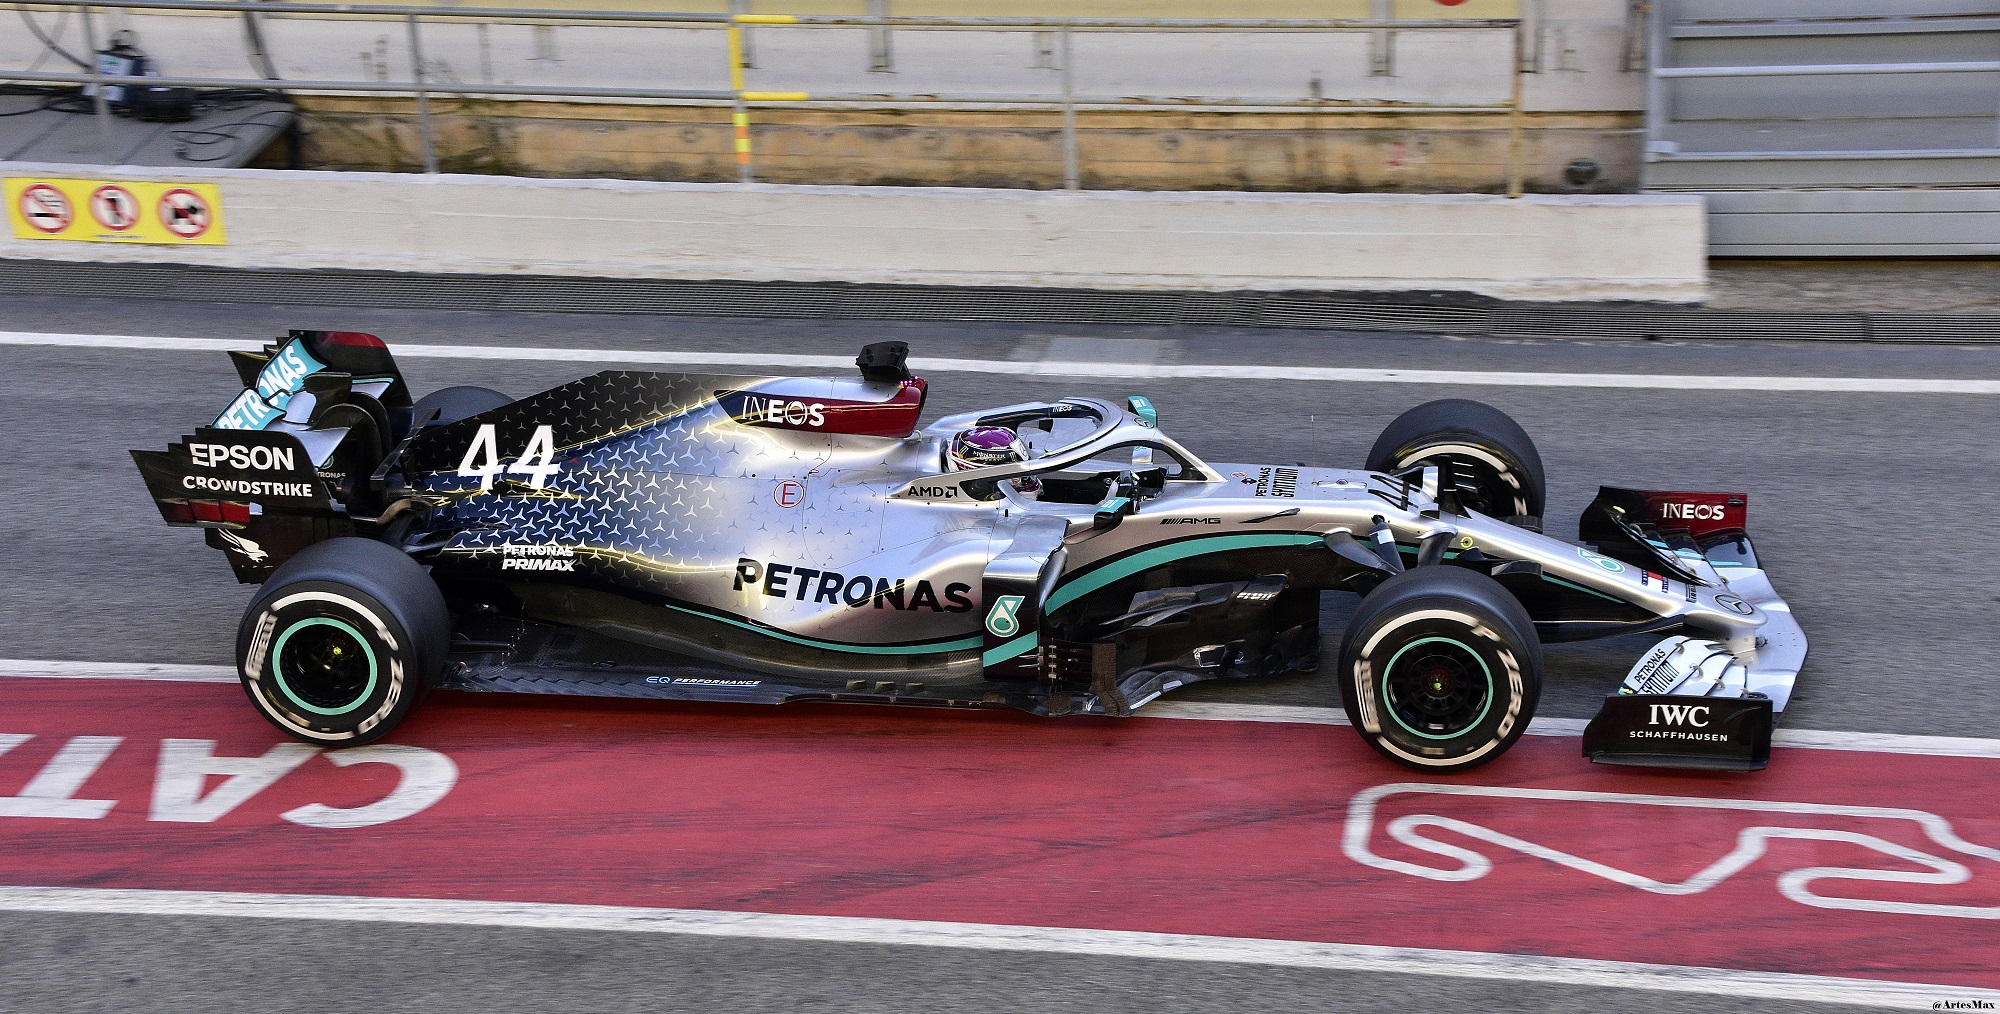 Hotelovernachtingen – Grand Prix van Spanje – F1 Barcelona 2021